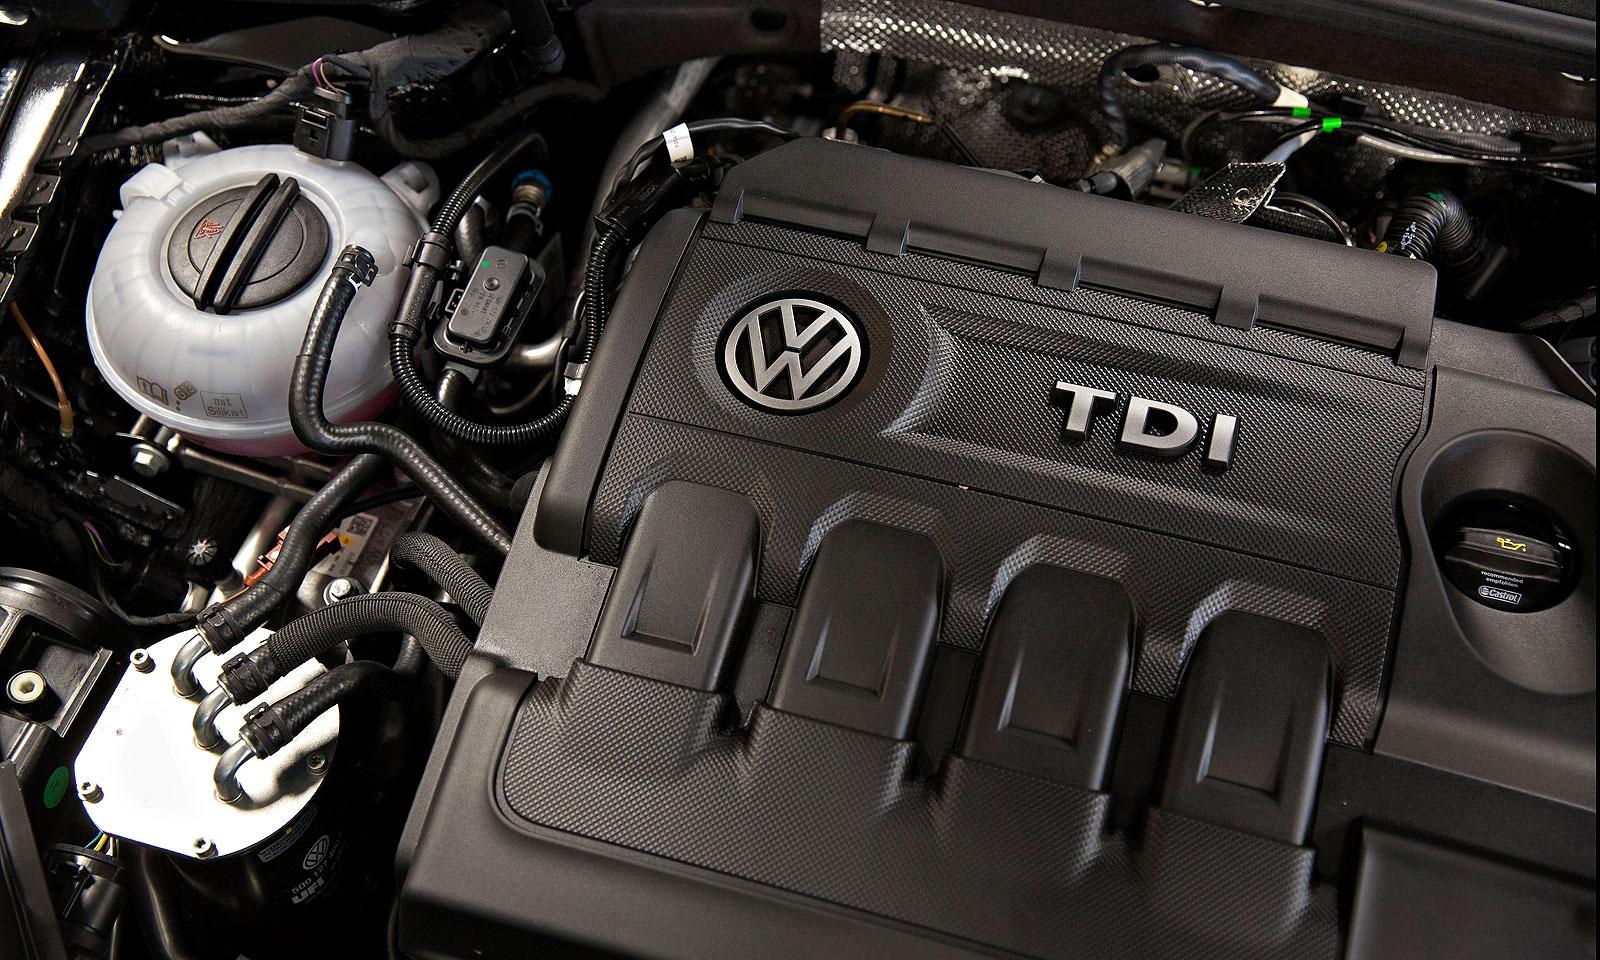 VW denies diesel fixes could damage engines